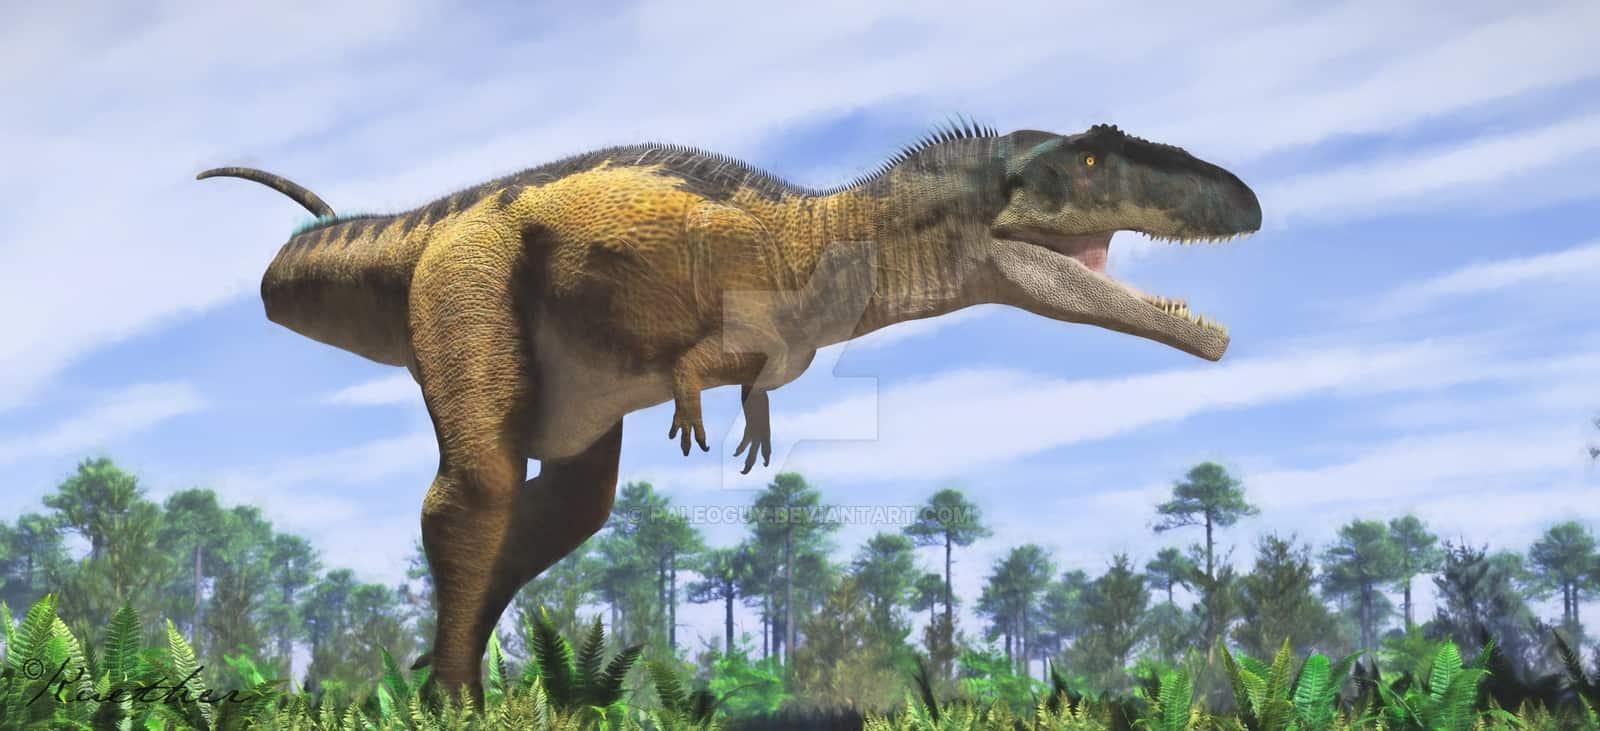 Mapusaurus by James Kuether